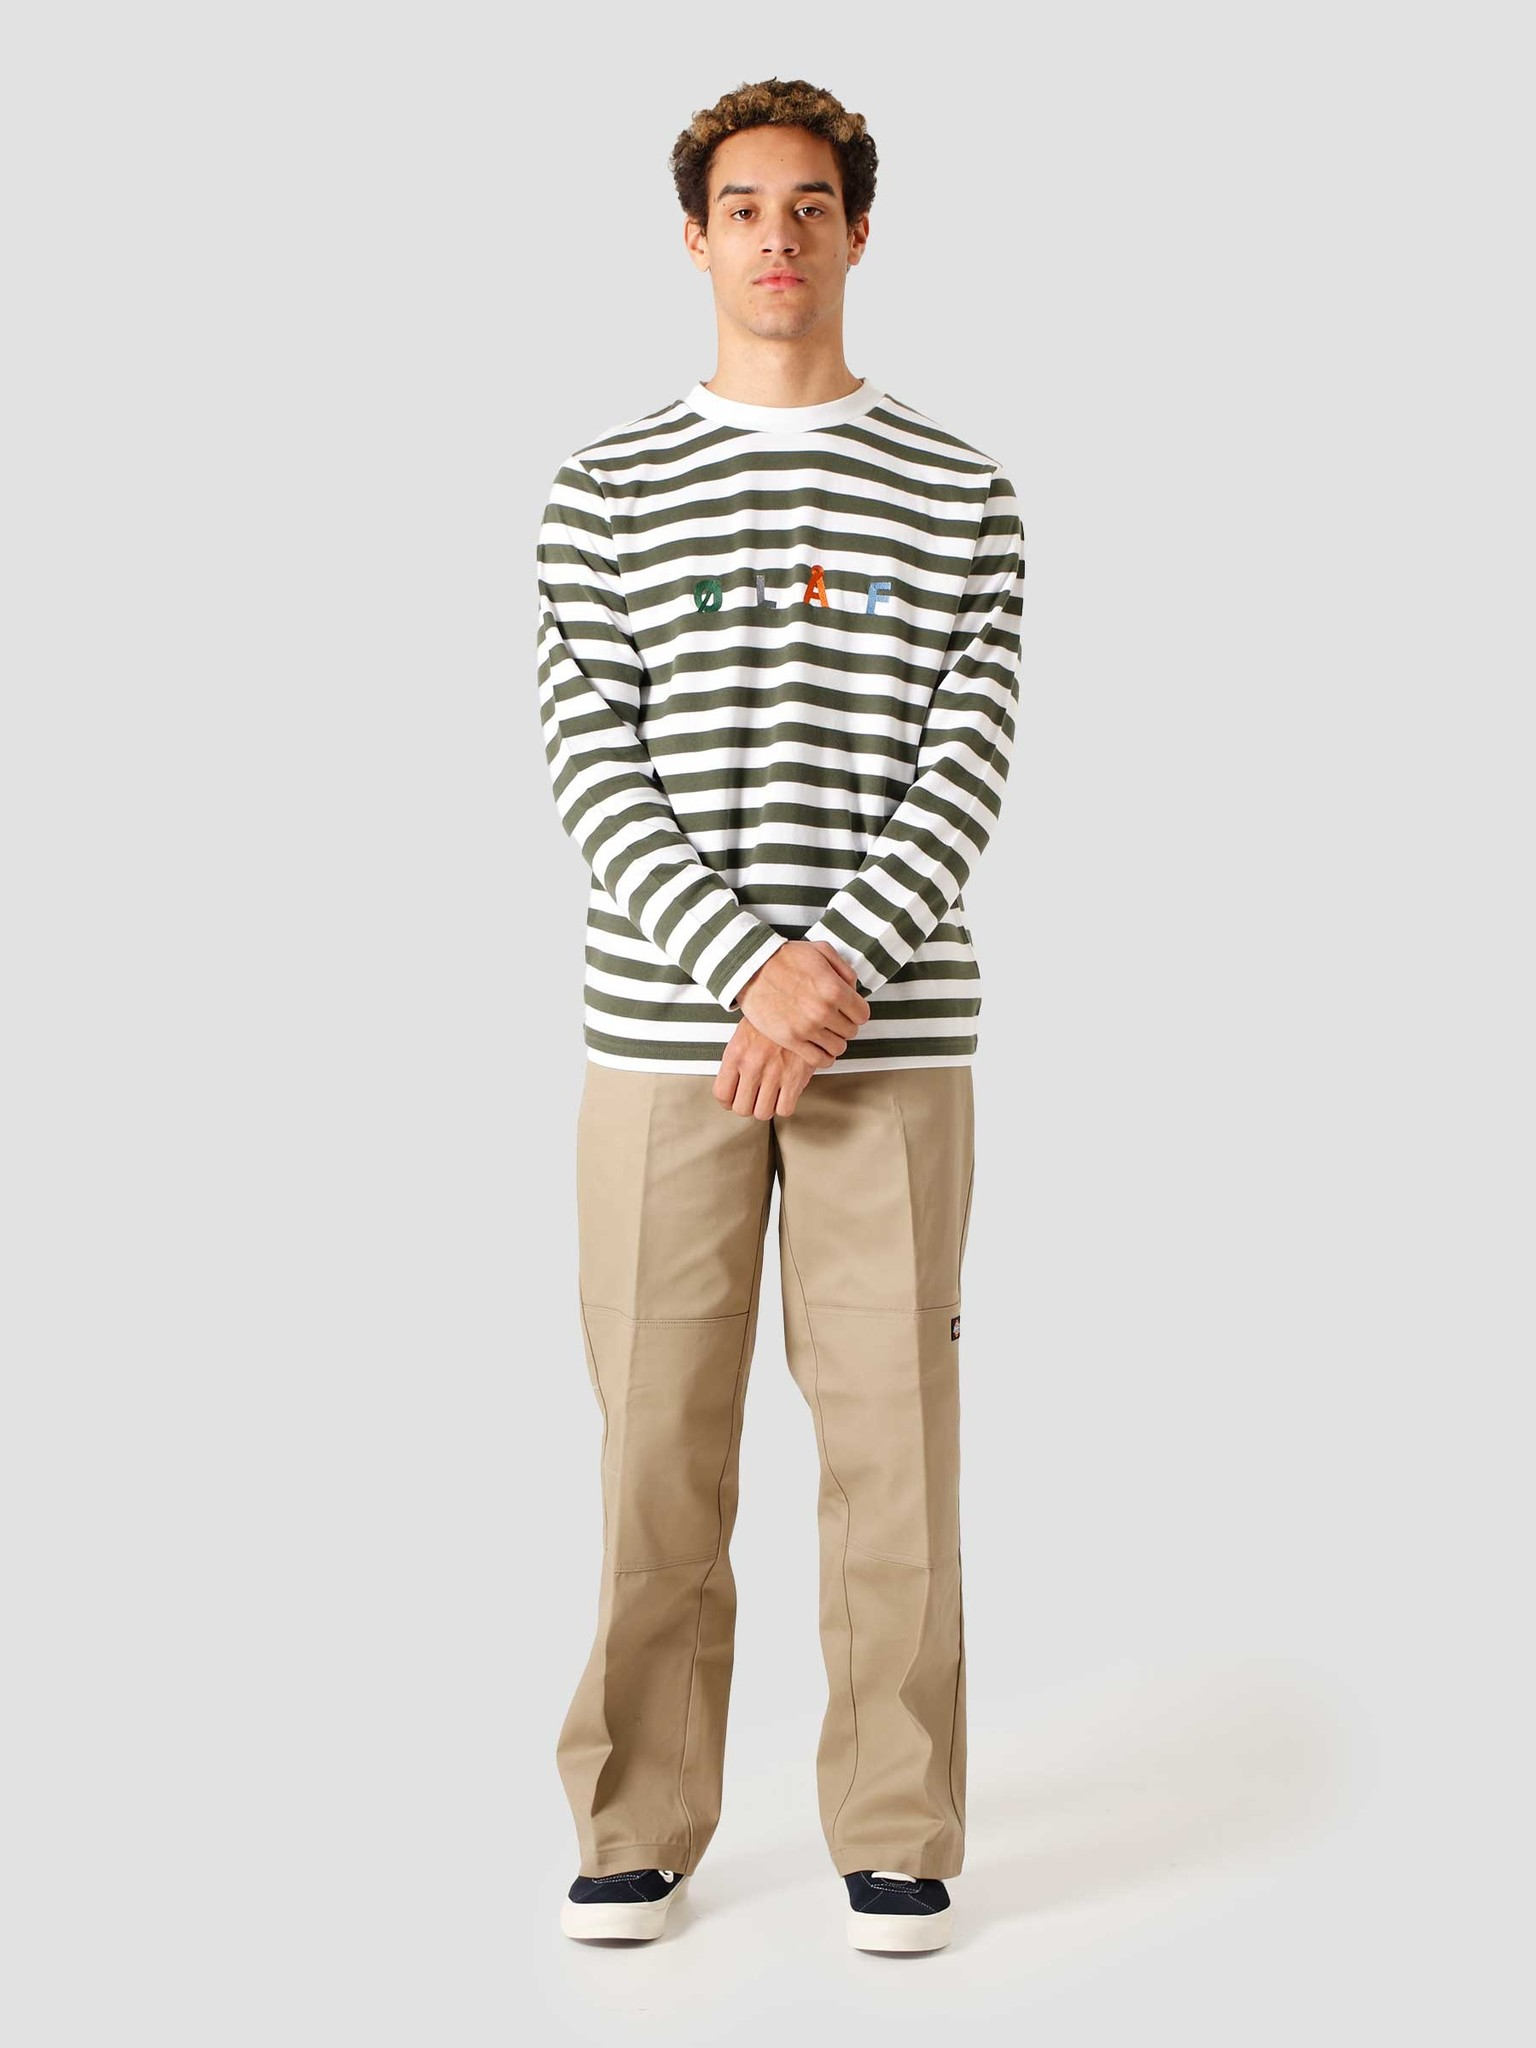 Olaf Hussein Olaf Hussein OH Stripe Sans Longsleeve T-Shirt Sage White